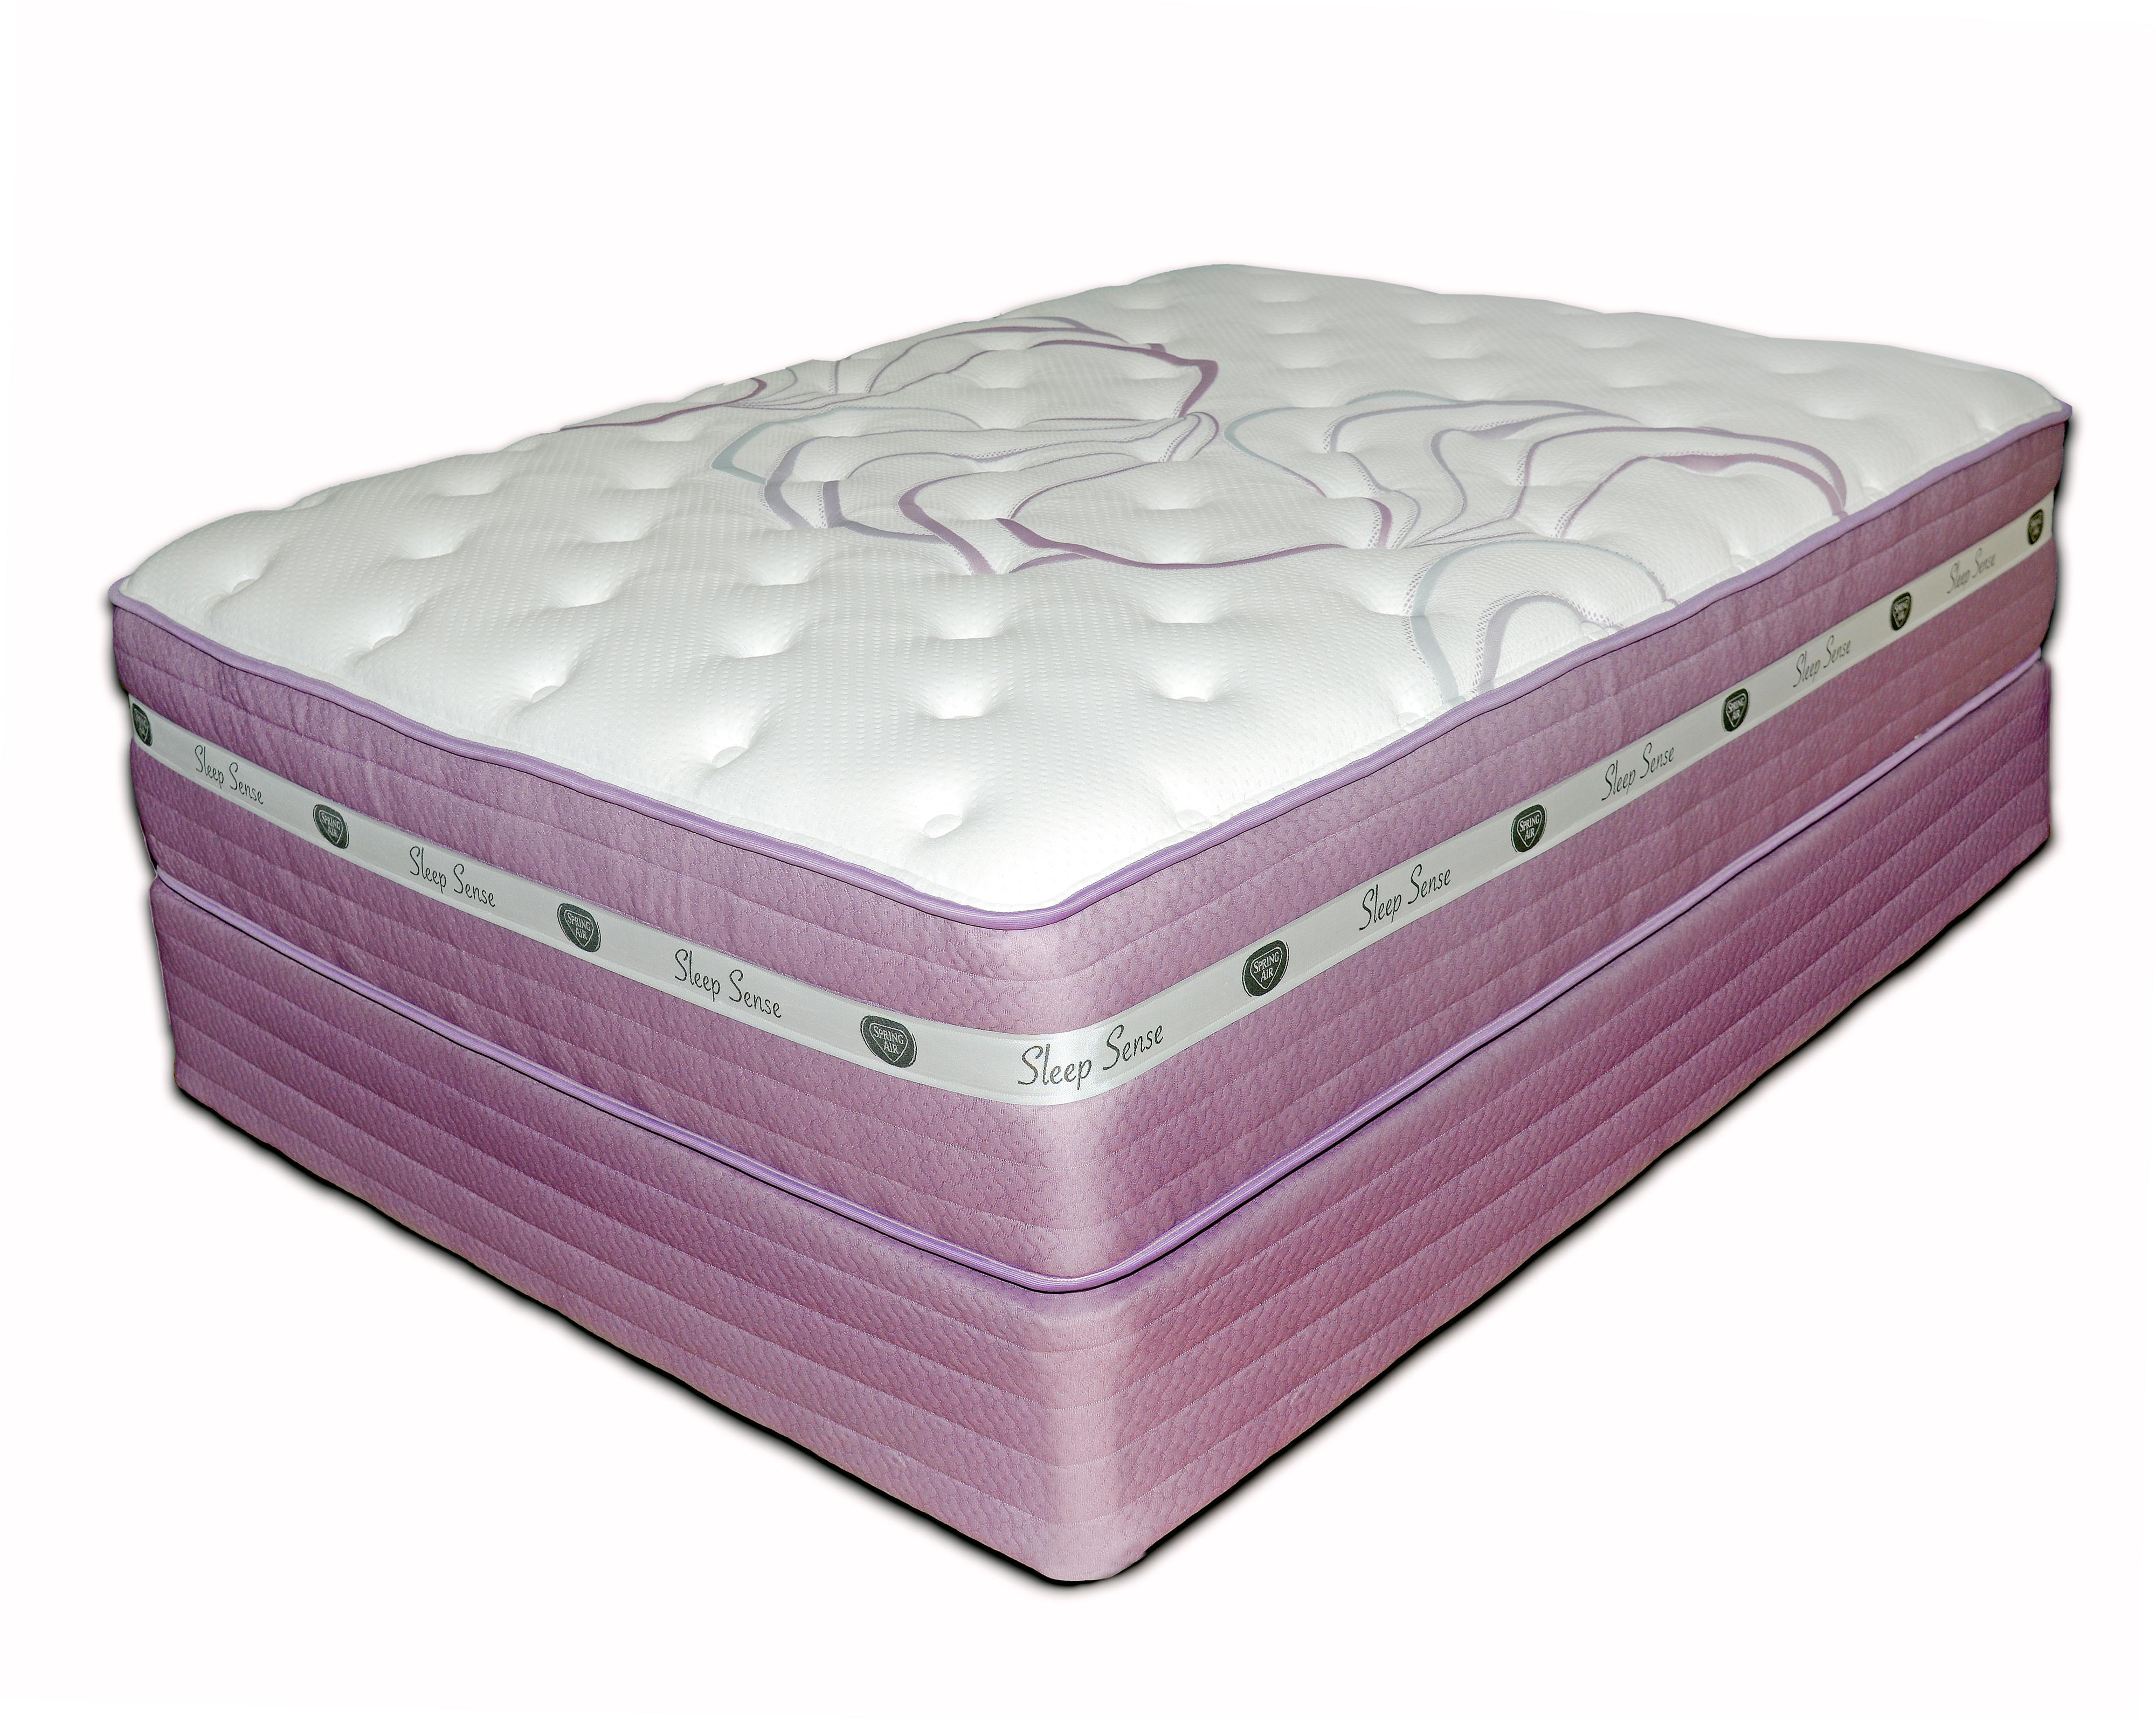 "Sleep Sense Purple Queen 14.5"" Latex Hybrid Mattress by Spring Air at Mueller Furniture"